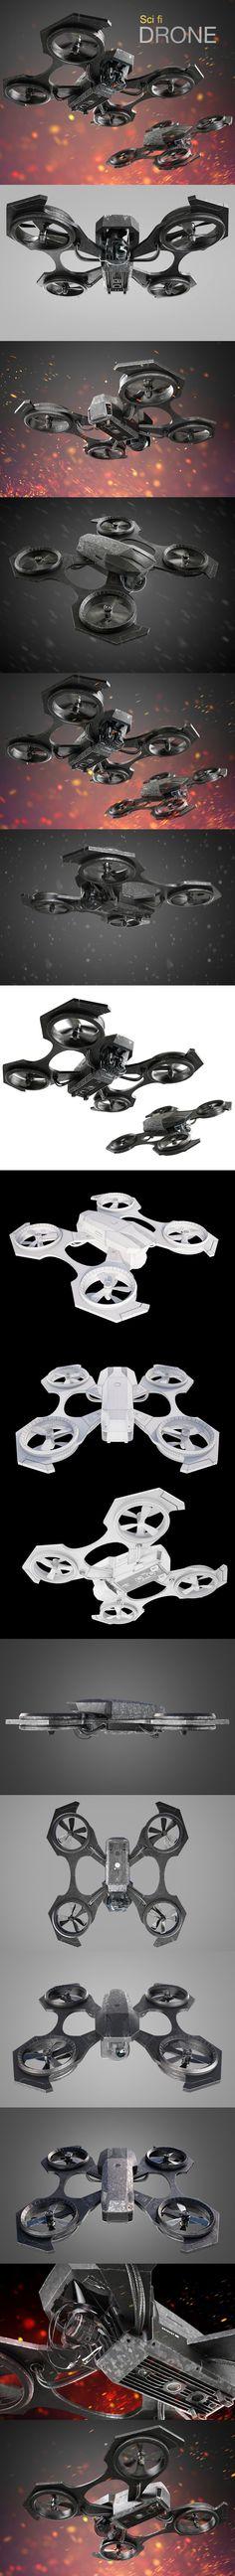 Drone. 3D Vehicles